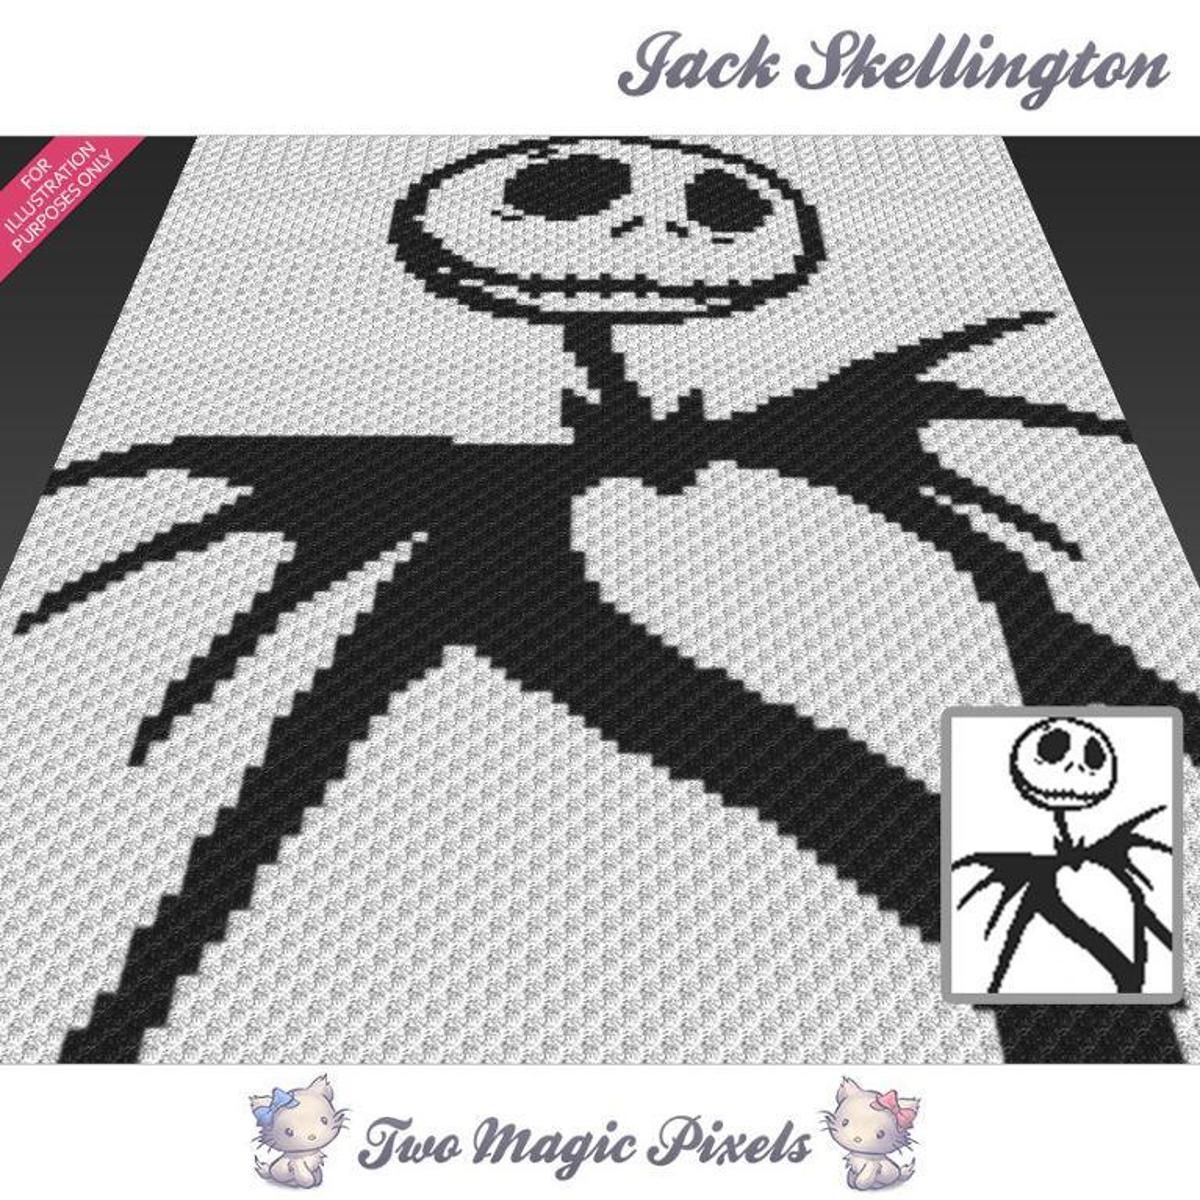 Jack Skellington C2C Crochet Graph | Crochet, Afghans and Crochet ...